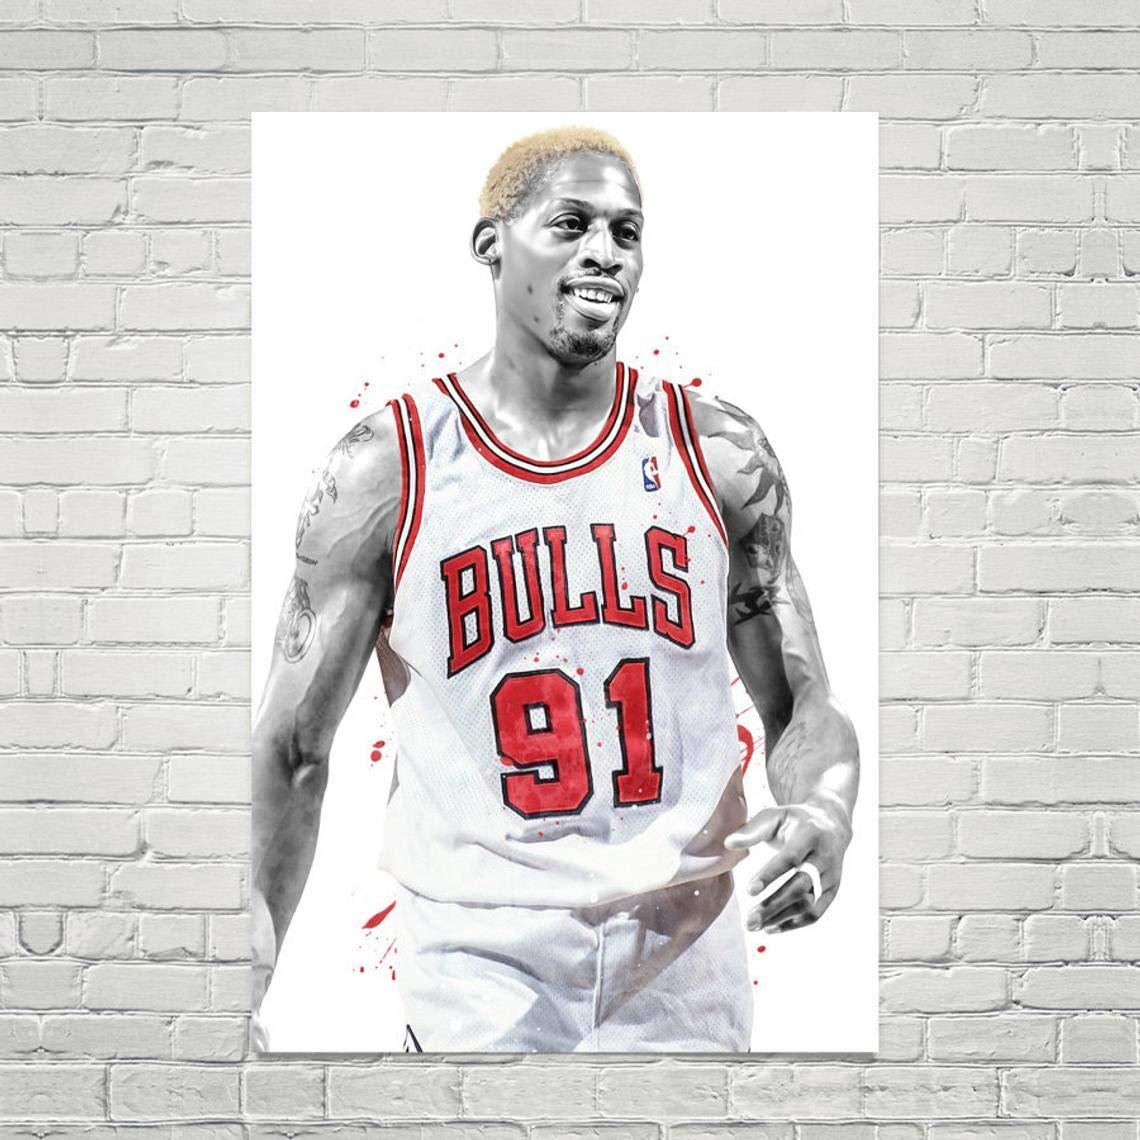 Dennis Rodman Art Print, Dennis Rodman Poster, Chicago Bulls Poster, Basketball Wall Art, Basketball Decor, NBA Poster, Watercolor Print, Man Cave Decor, Sport Posters